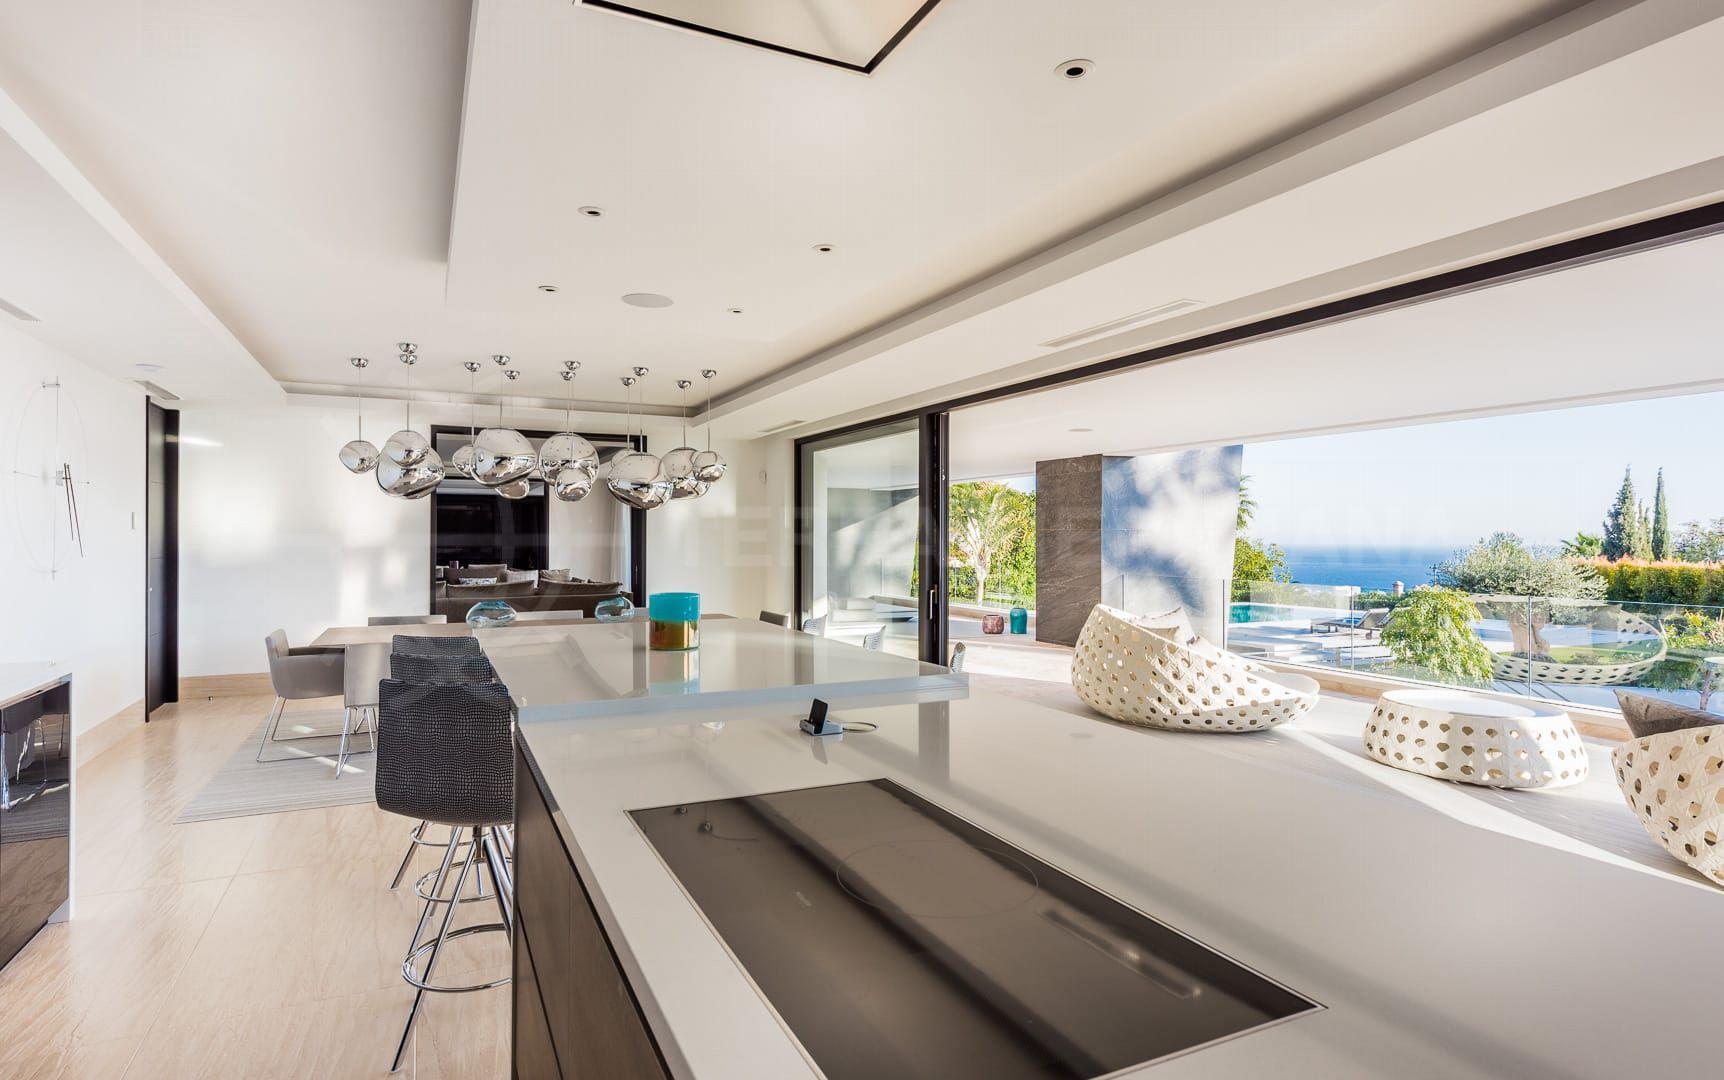 Tenants' guide to long-term rentals in Costa del Sol